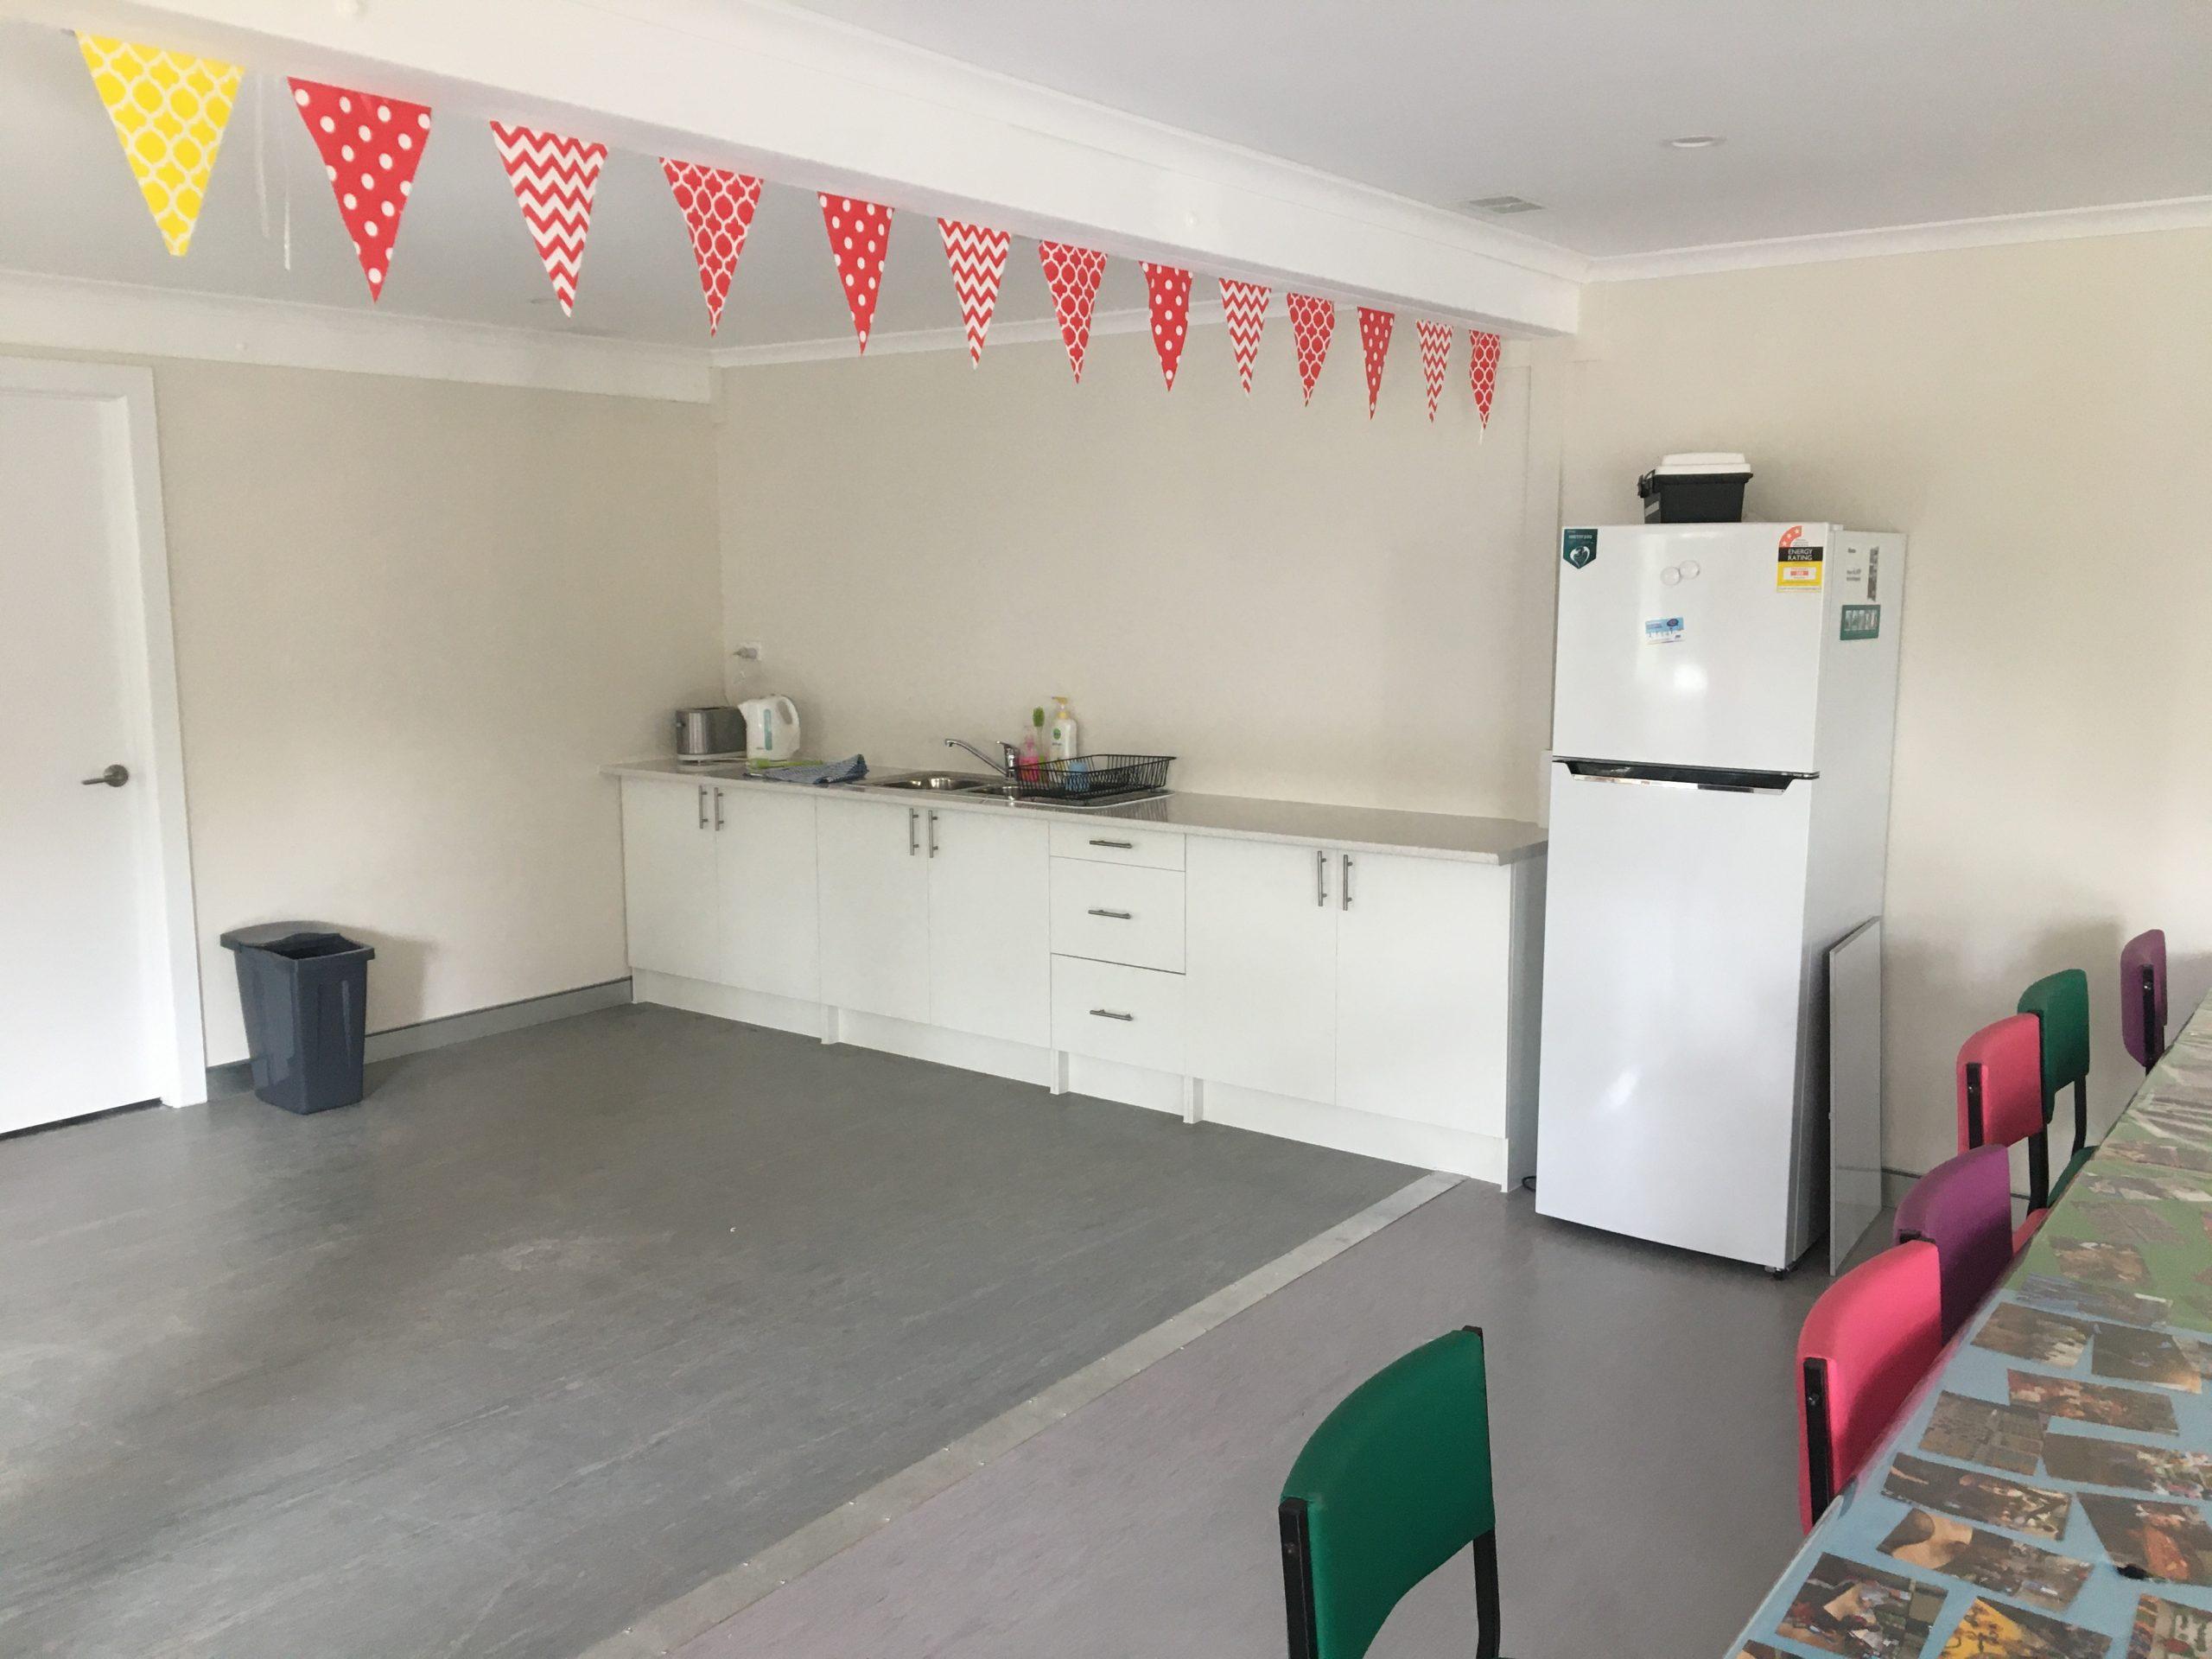 Demountable classroom kitchenette and wet area